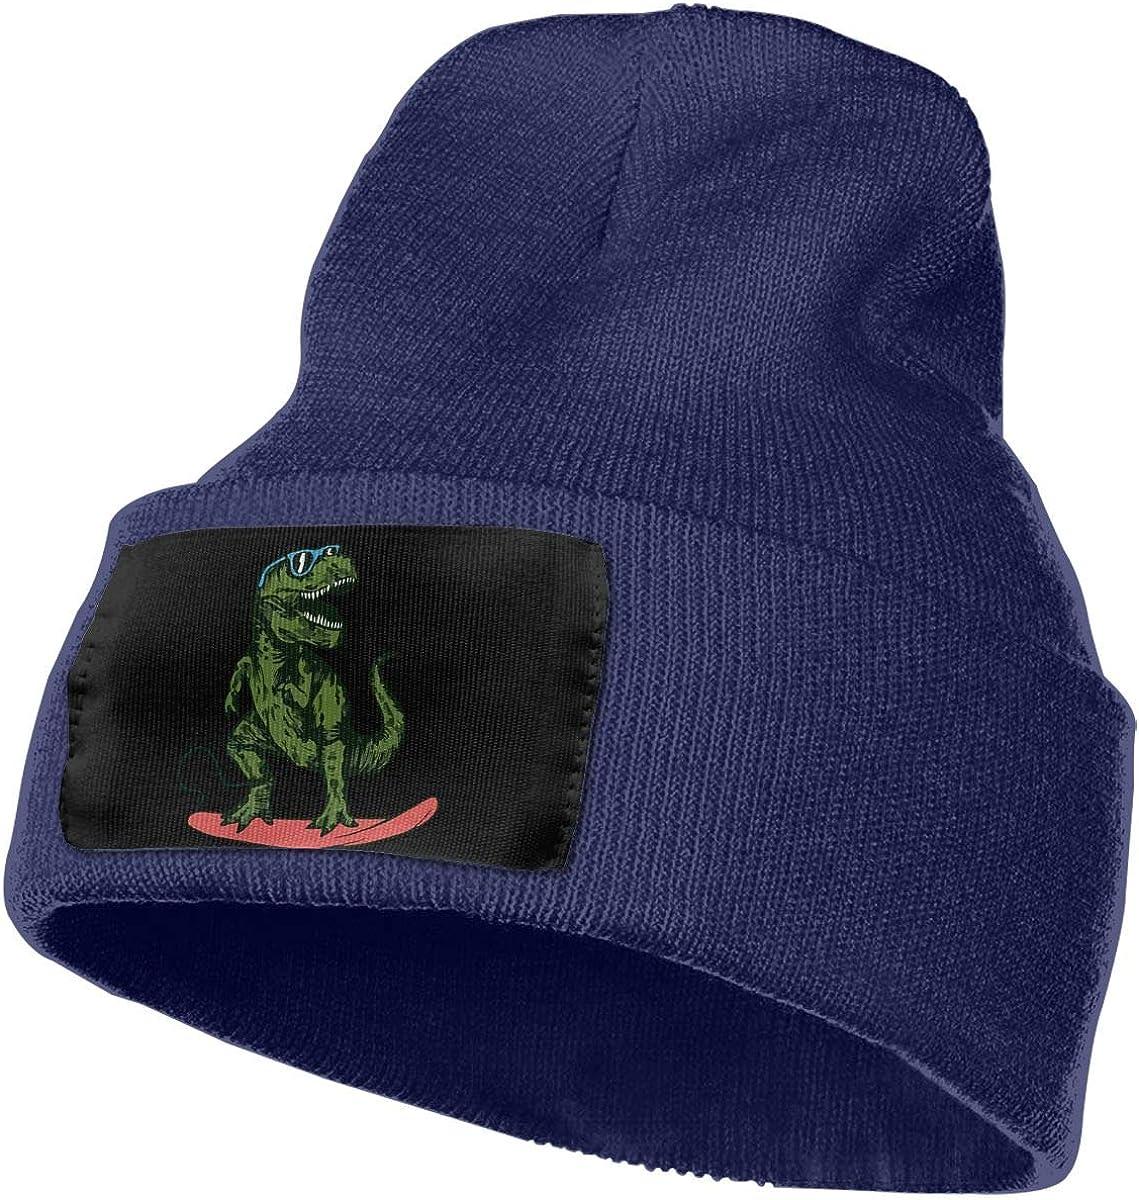 WHOO93@Y Mens Womens 100/% Acrylic Knitting Hat Cap Happy Dinosaur Surfer Wearing Sunglasses Cute Ski Cap